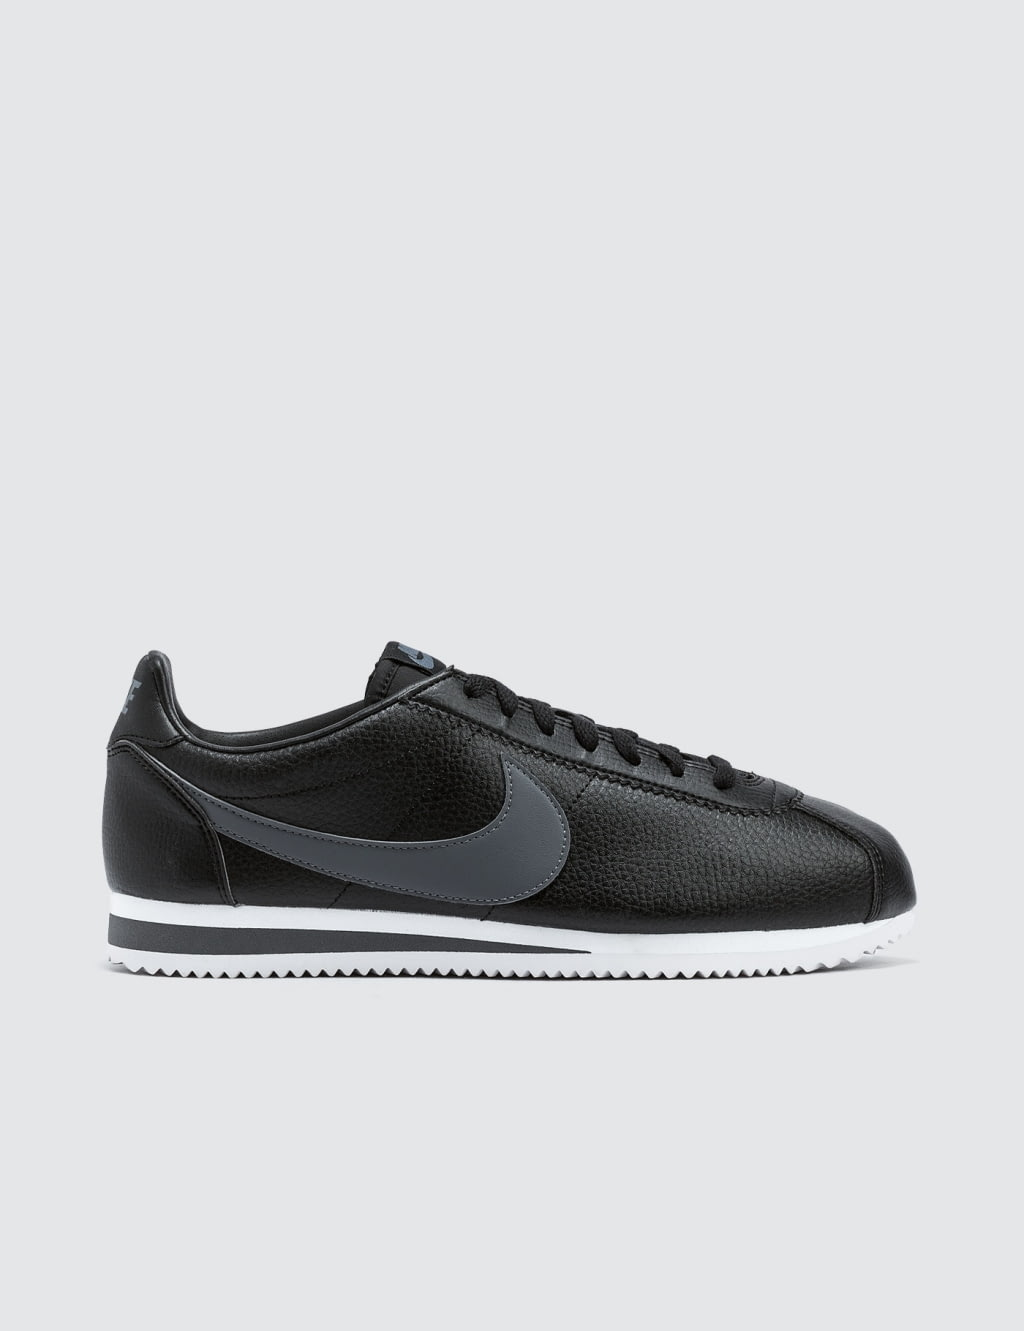 sports shoes 7124b ee516 reduced nike cortez original c6fee 1b915